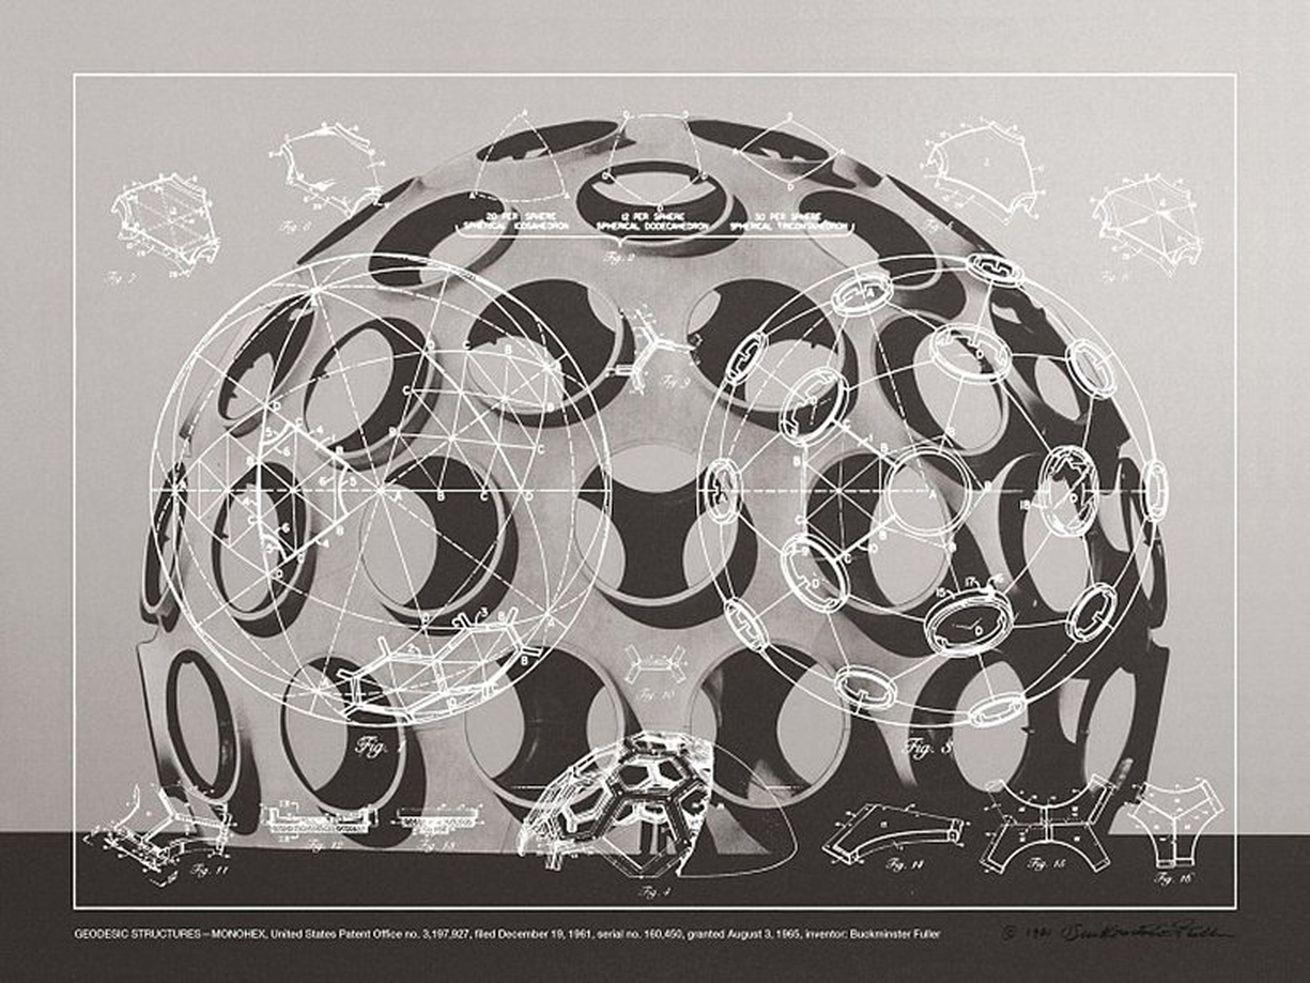 Buckminster Fuller, <em>Geodesic Structures - Monohex</em>, 1981